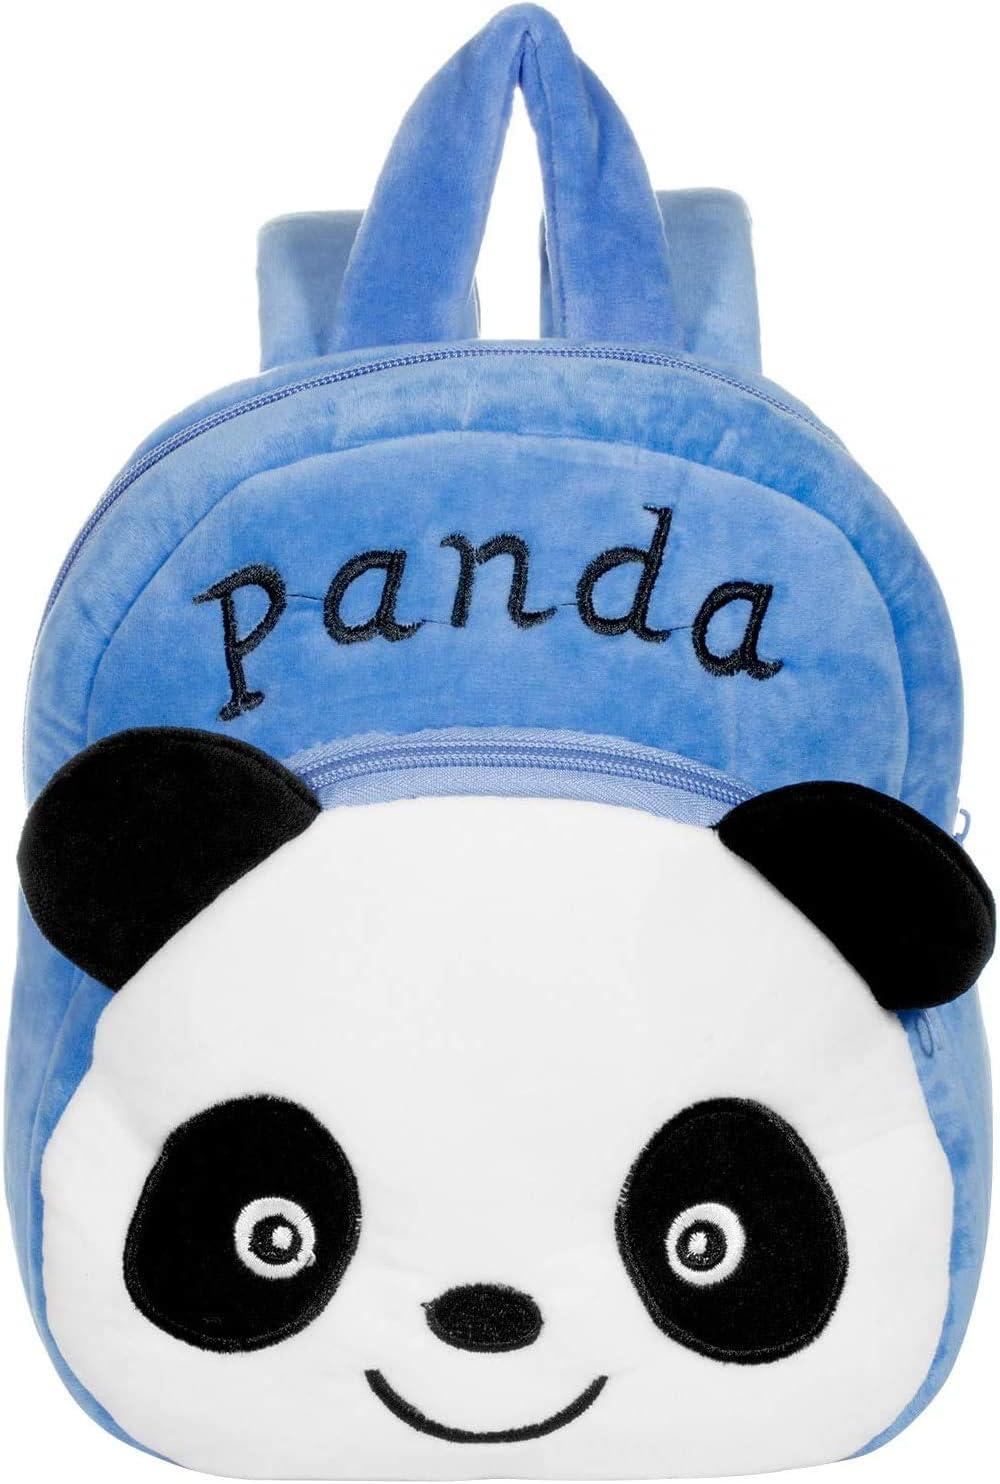 Panda Toddler Kids Backpack Present /& Gifts Little Rucksack for Kids Children Boys Girls Cute Panda Design 3D Cartoon Preschool Rucksack PTN Nursery Toddle Children School Bag Lunch Bag